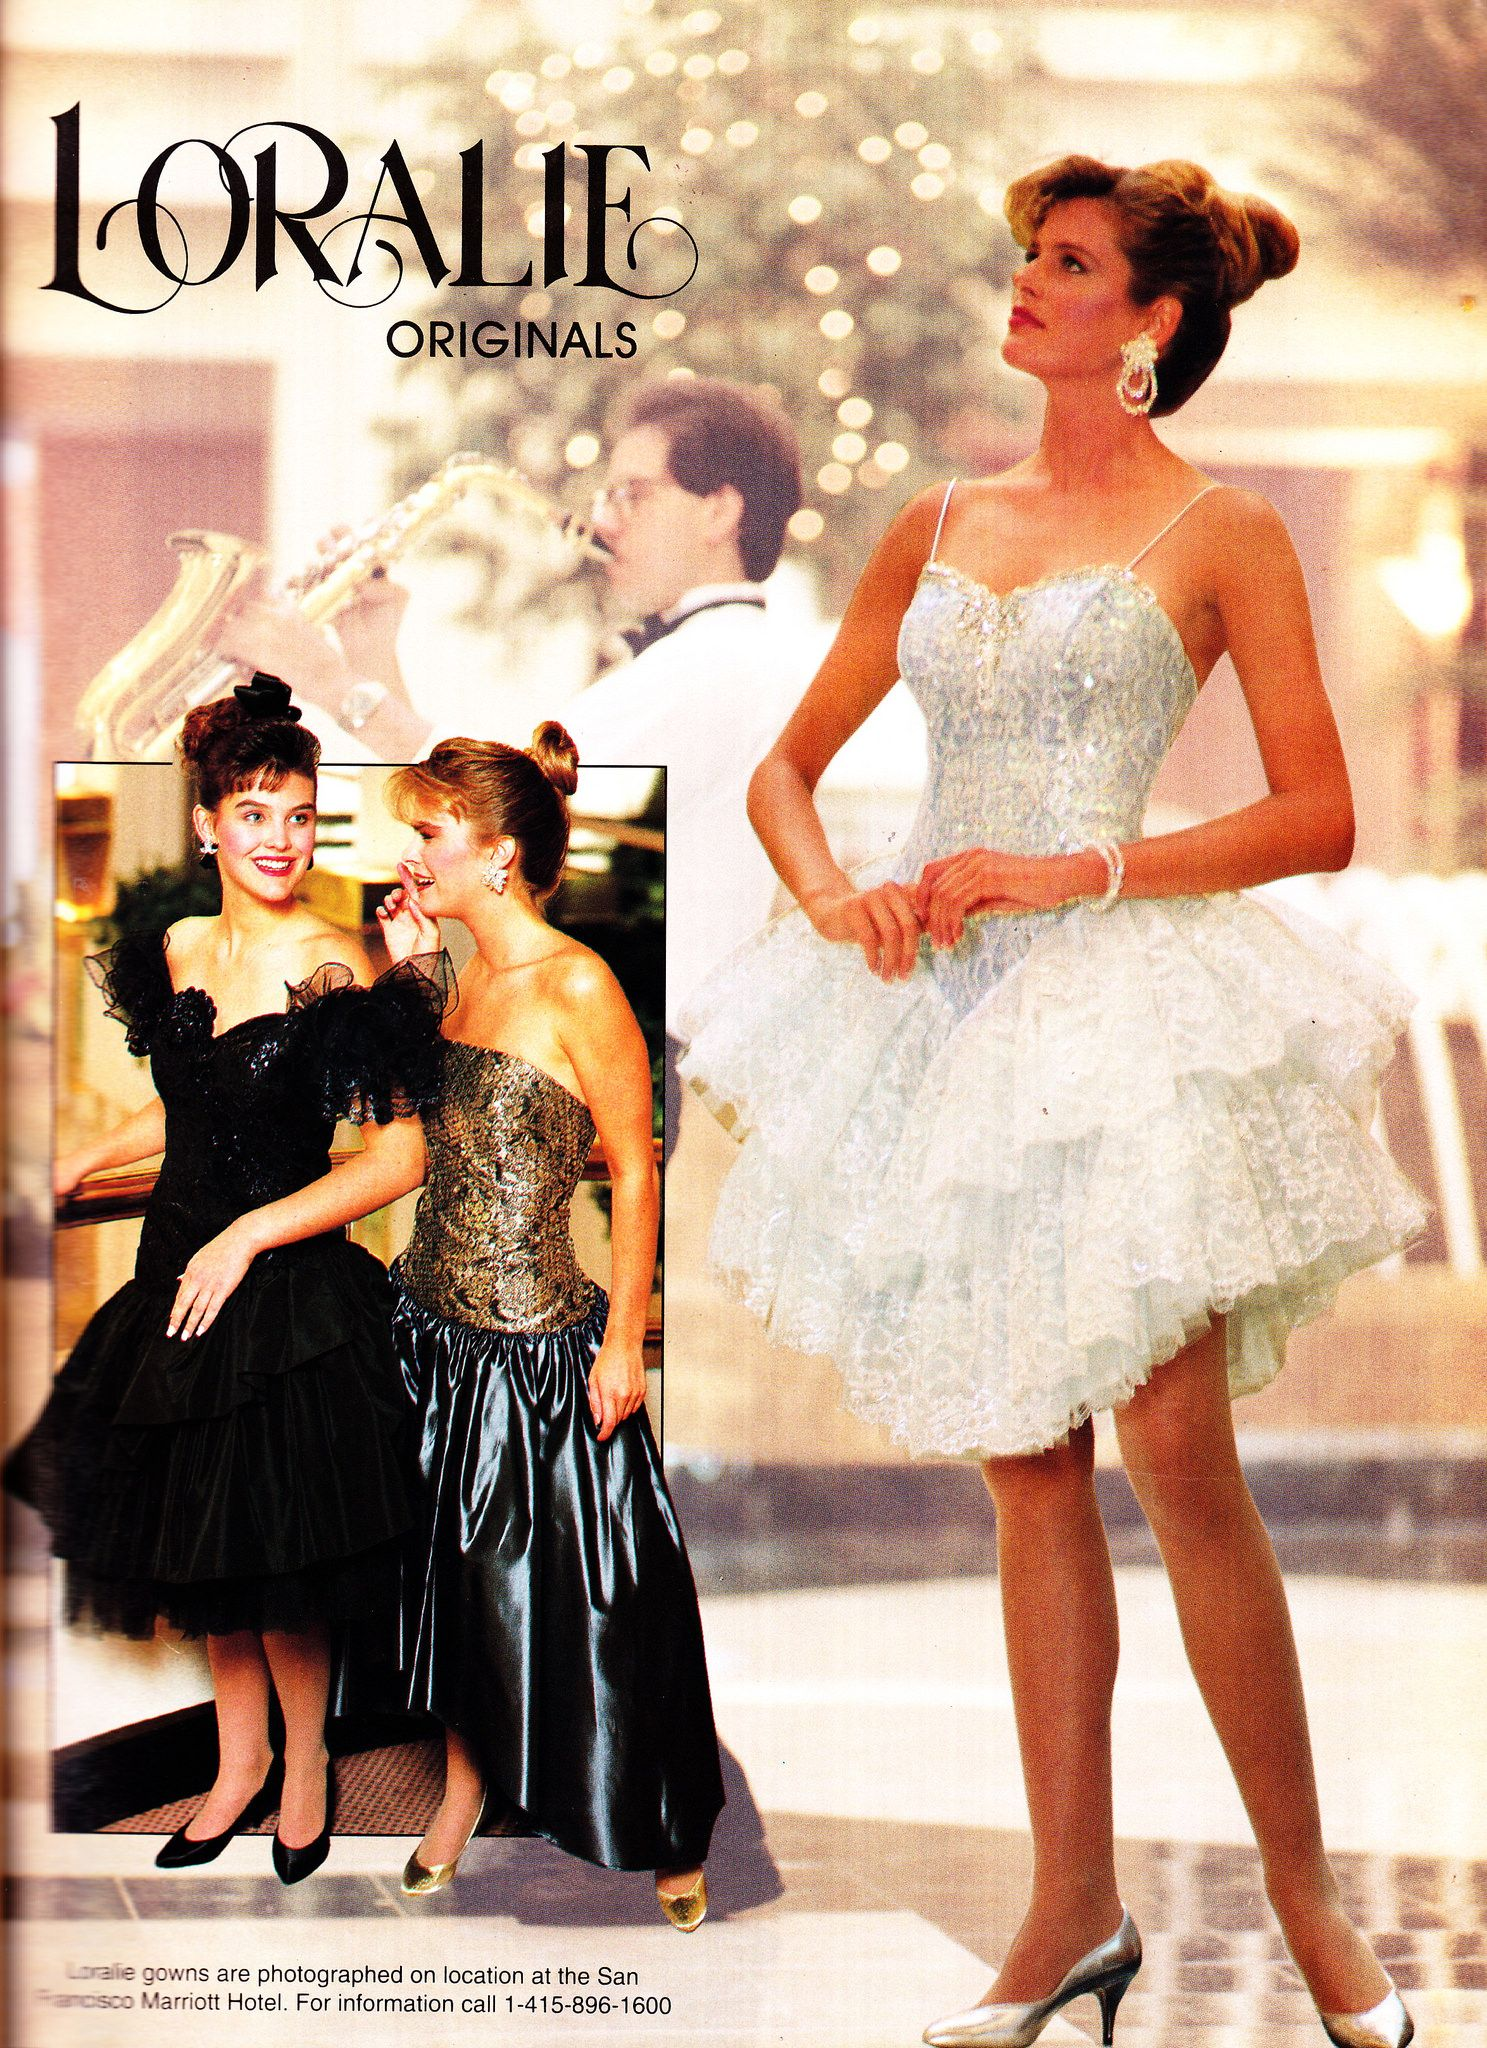 Loralie 1991 Old Fashion Dresses Fashion 80s And 90s Fashion [ 2048 x 1487 Pixel ]